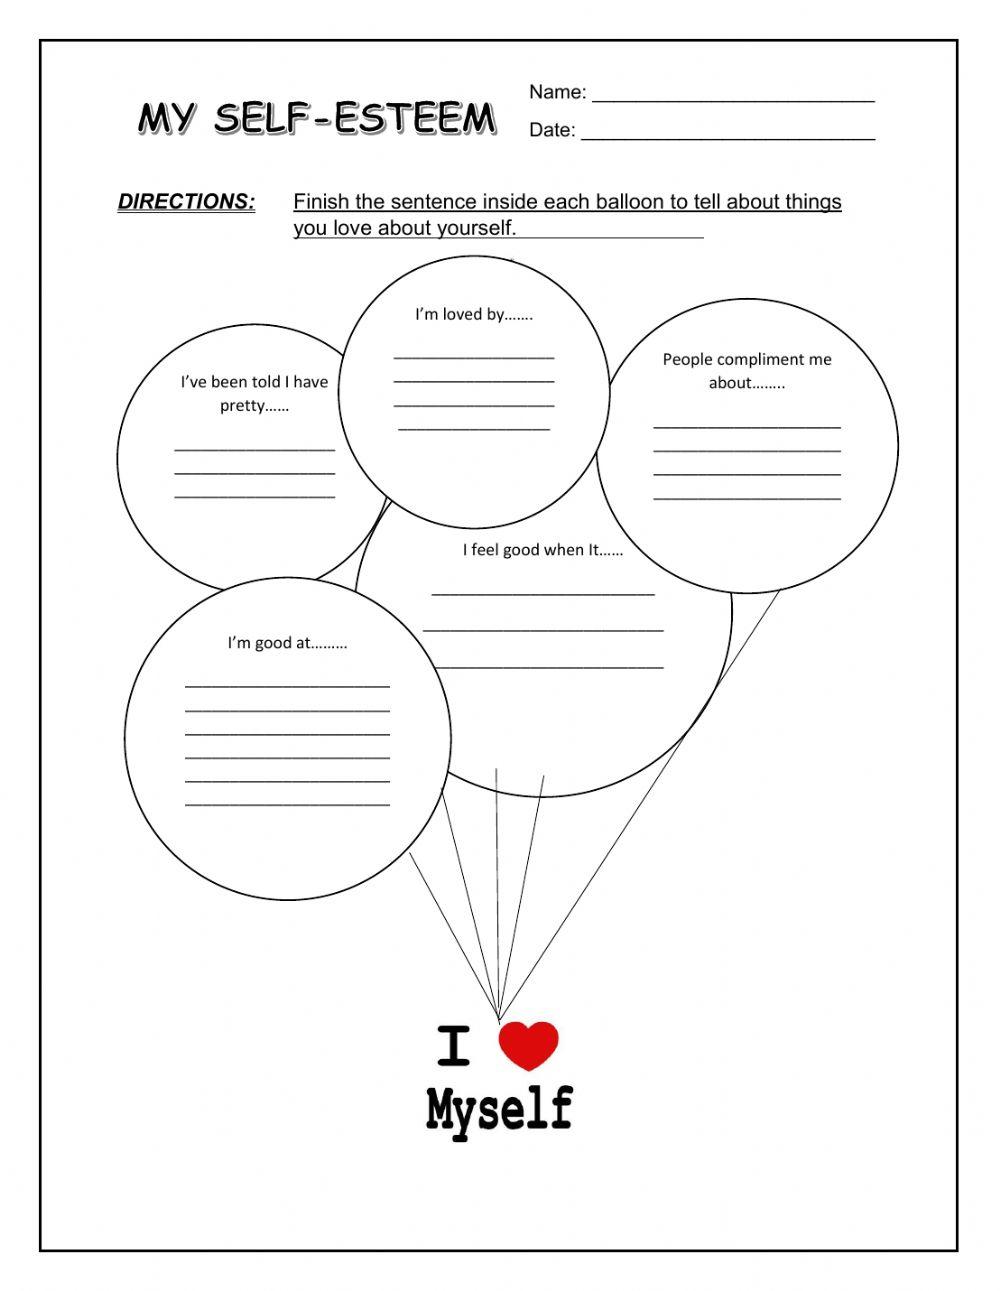 My Self-Esteem Worksheet